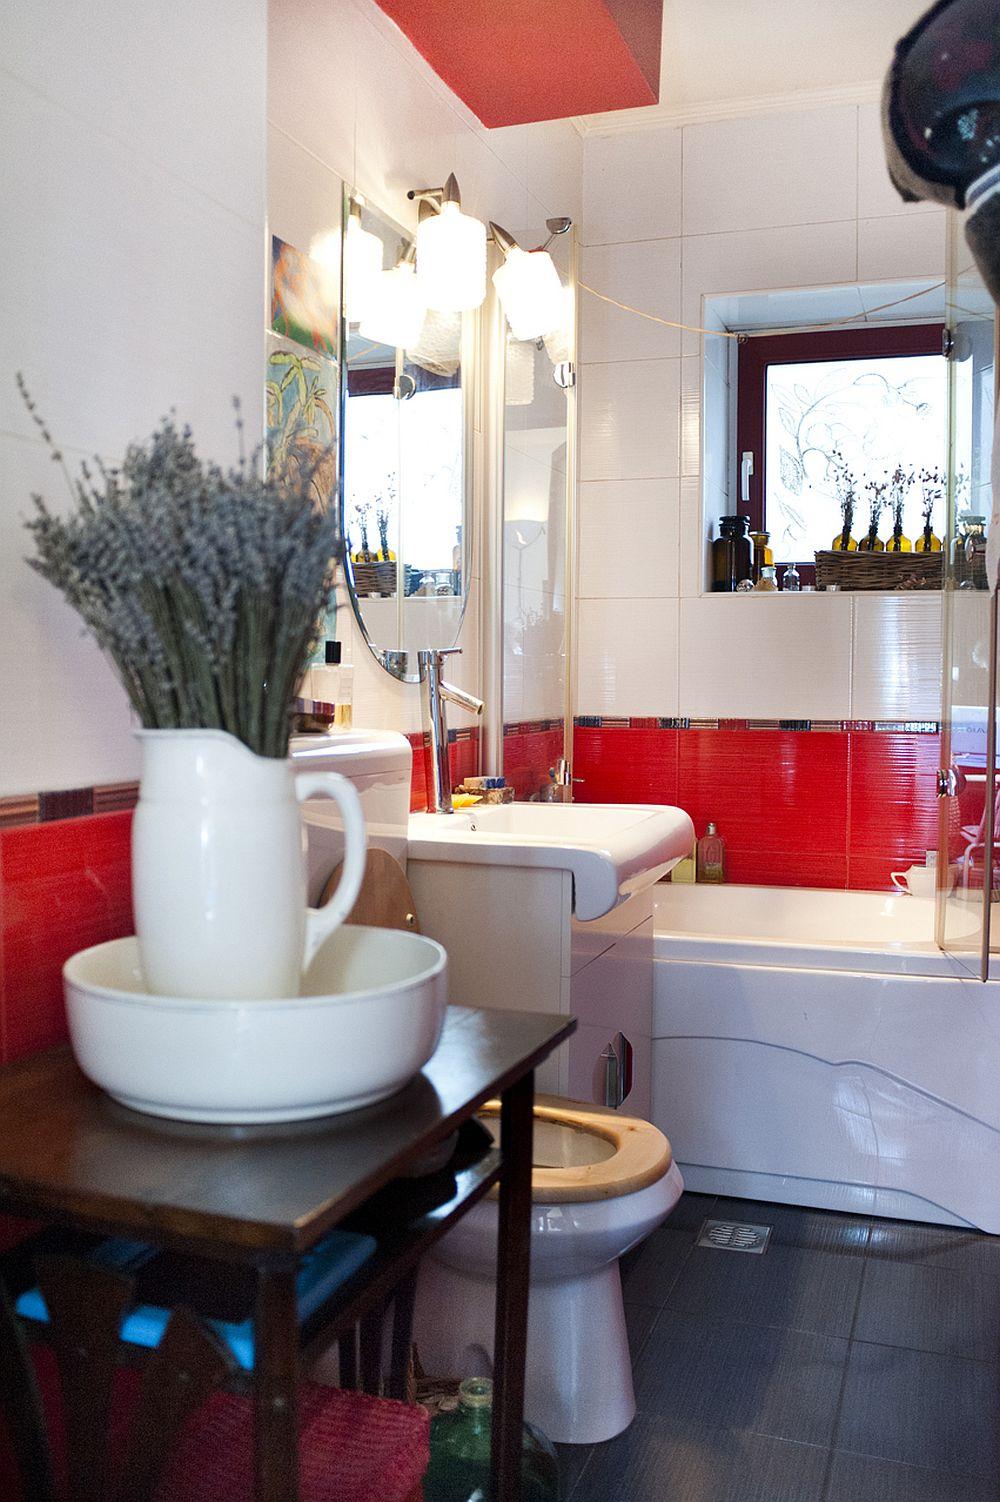 adelaparvu.com despre apartament boem de doua camere Bucuresti, designer Mihaela Poenaru, Foto Dragos Boldea (39)